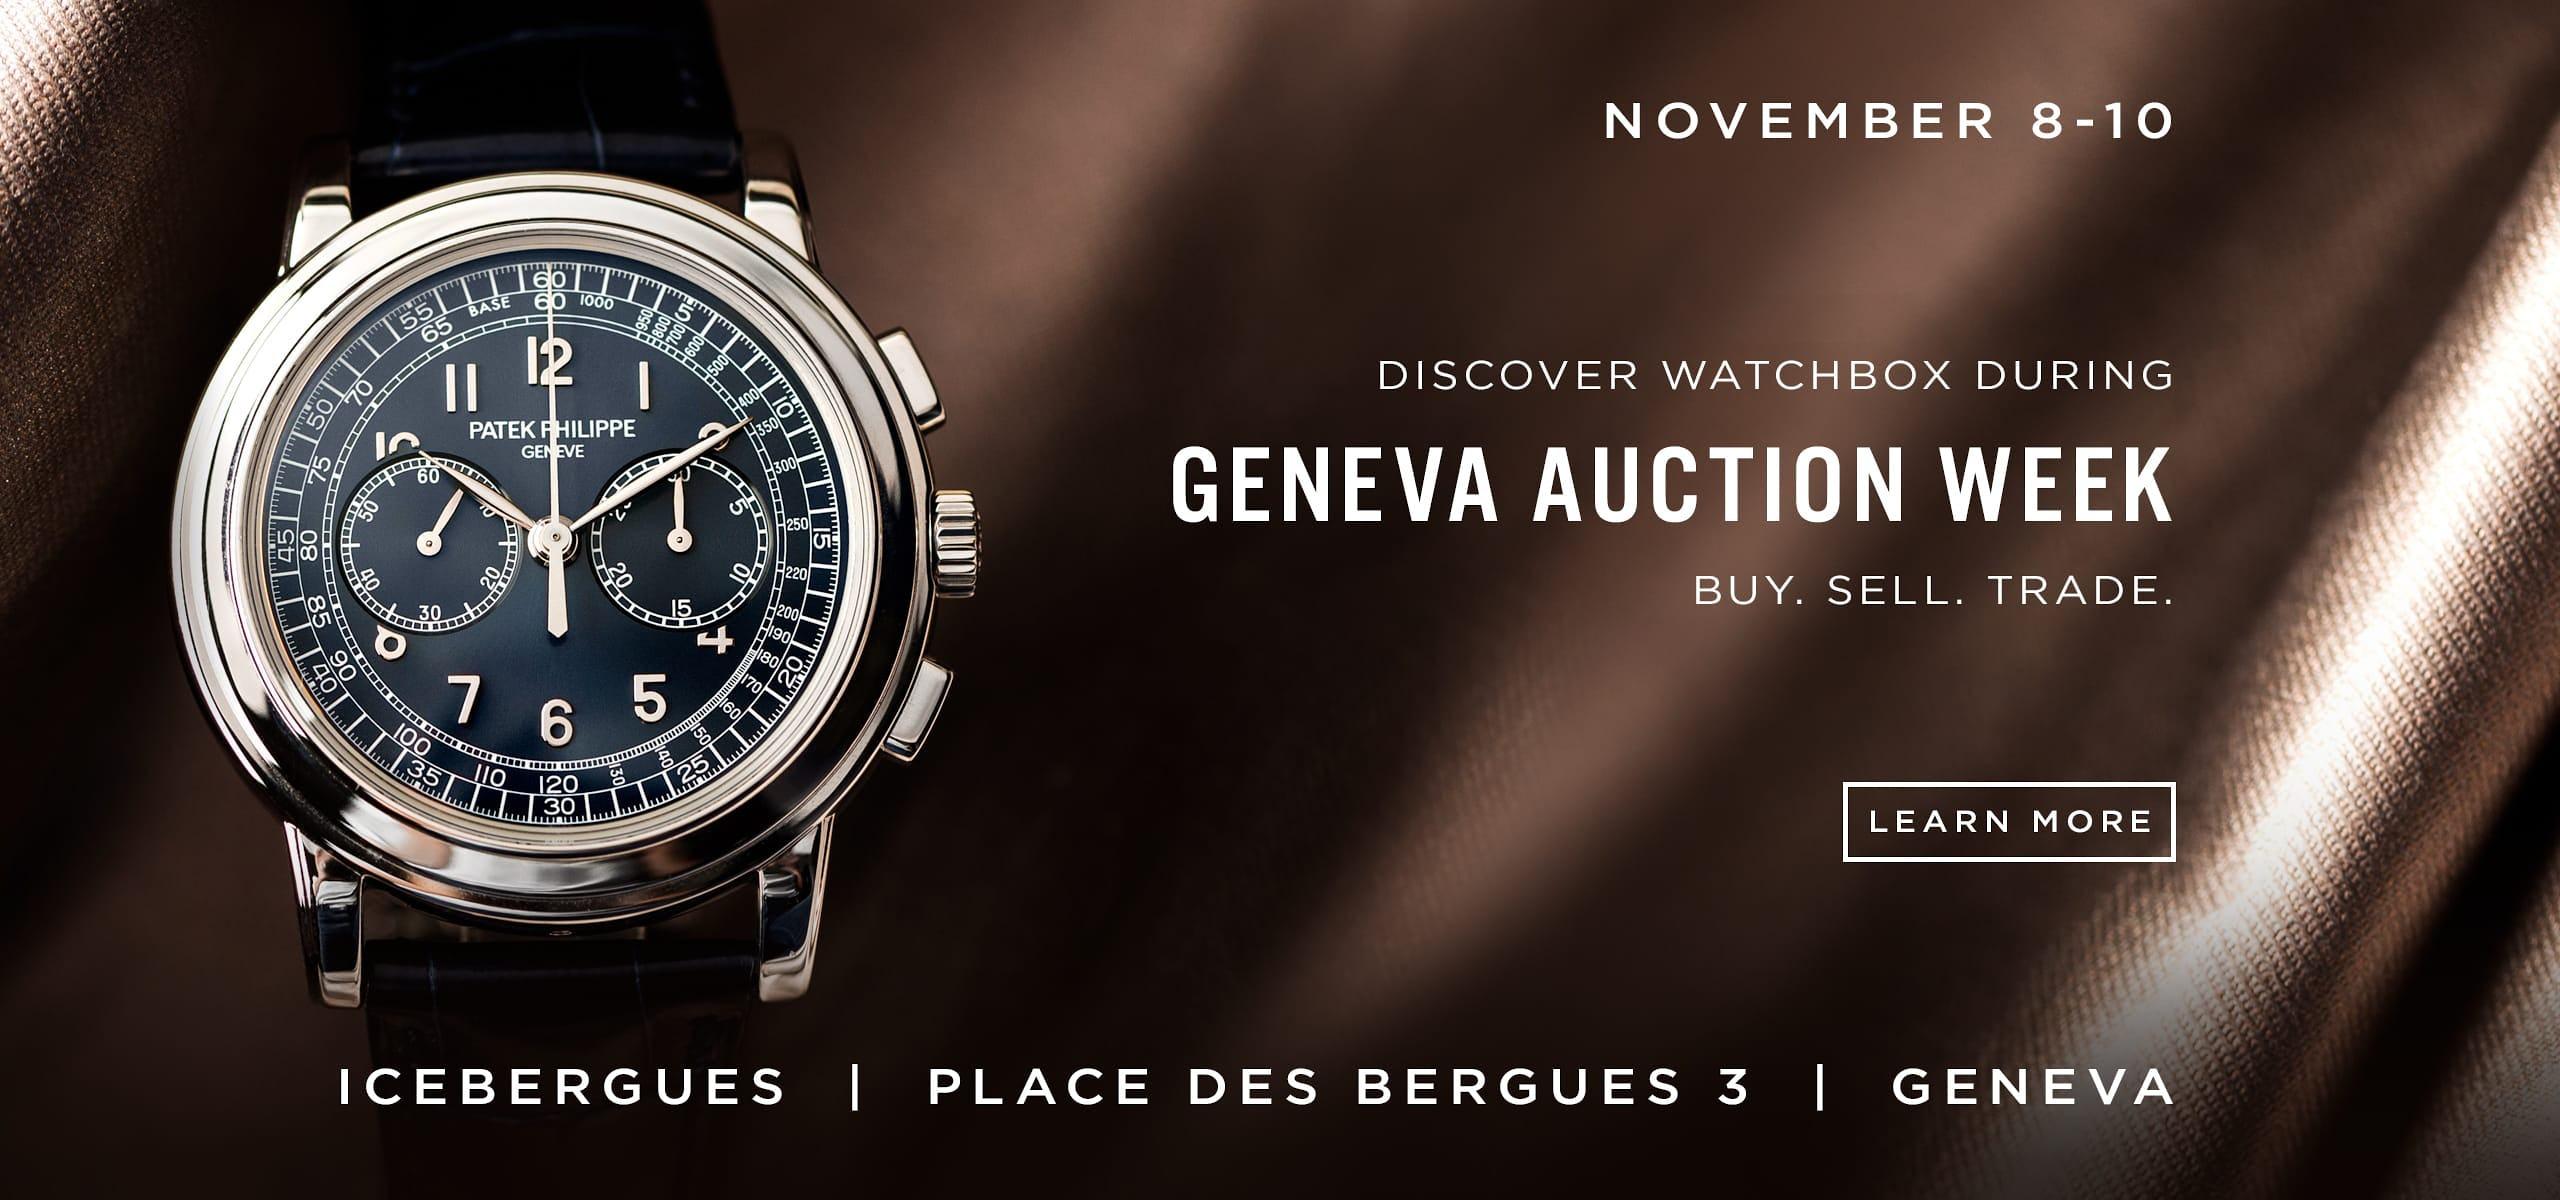 WatchBox at Geneva Auction Week